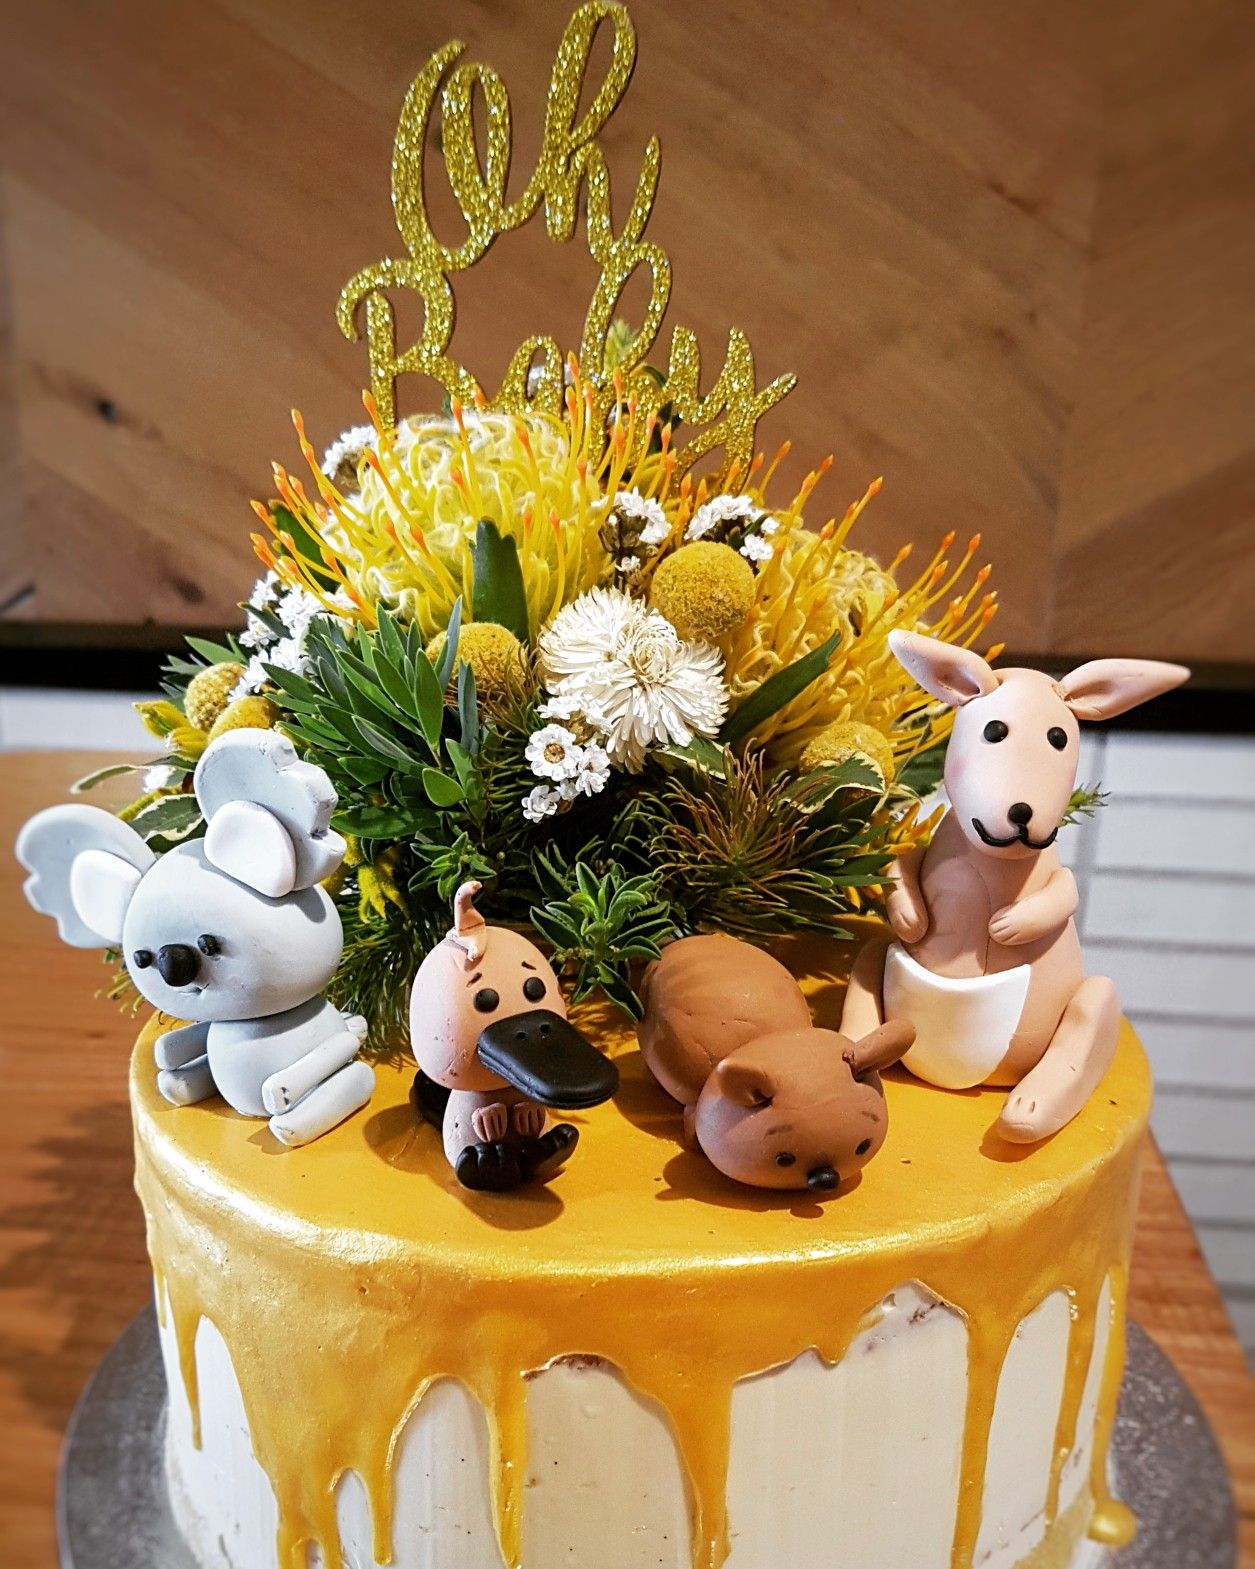 Australiana themed baby shower cake featuring Australian